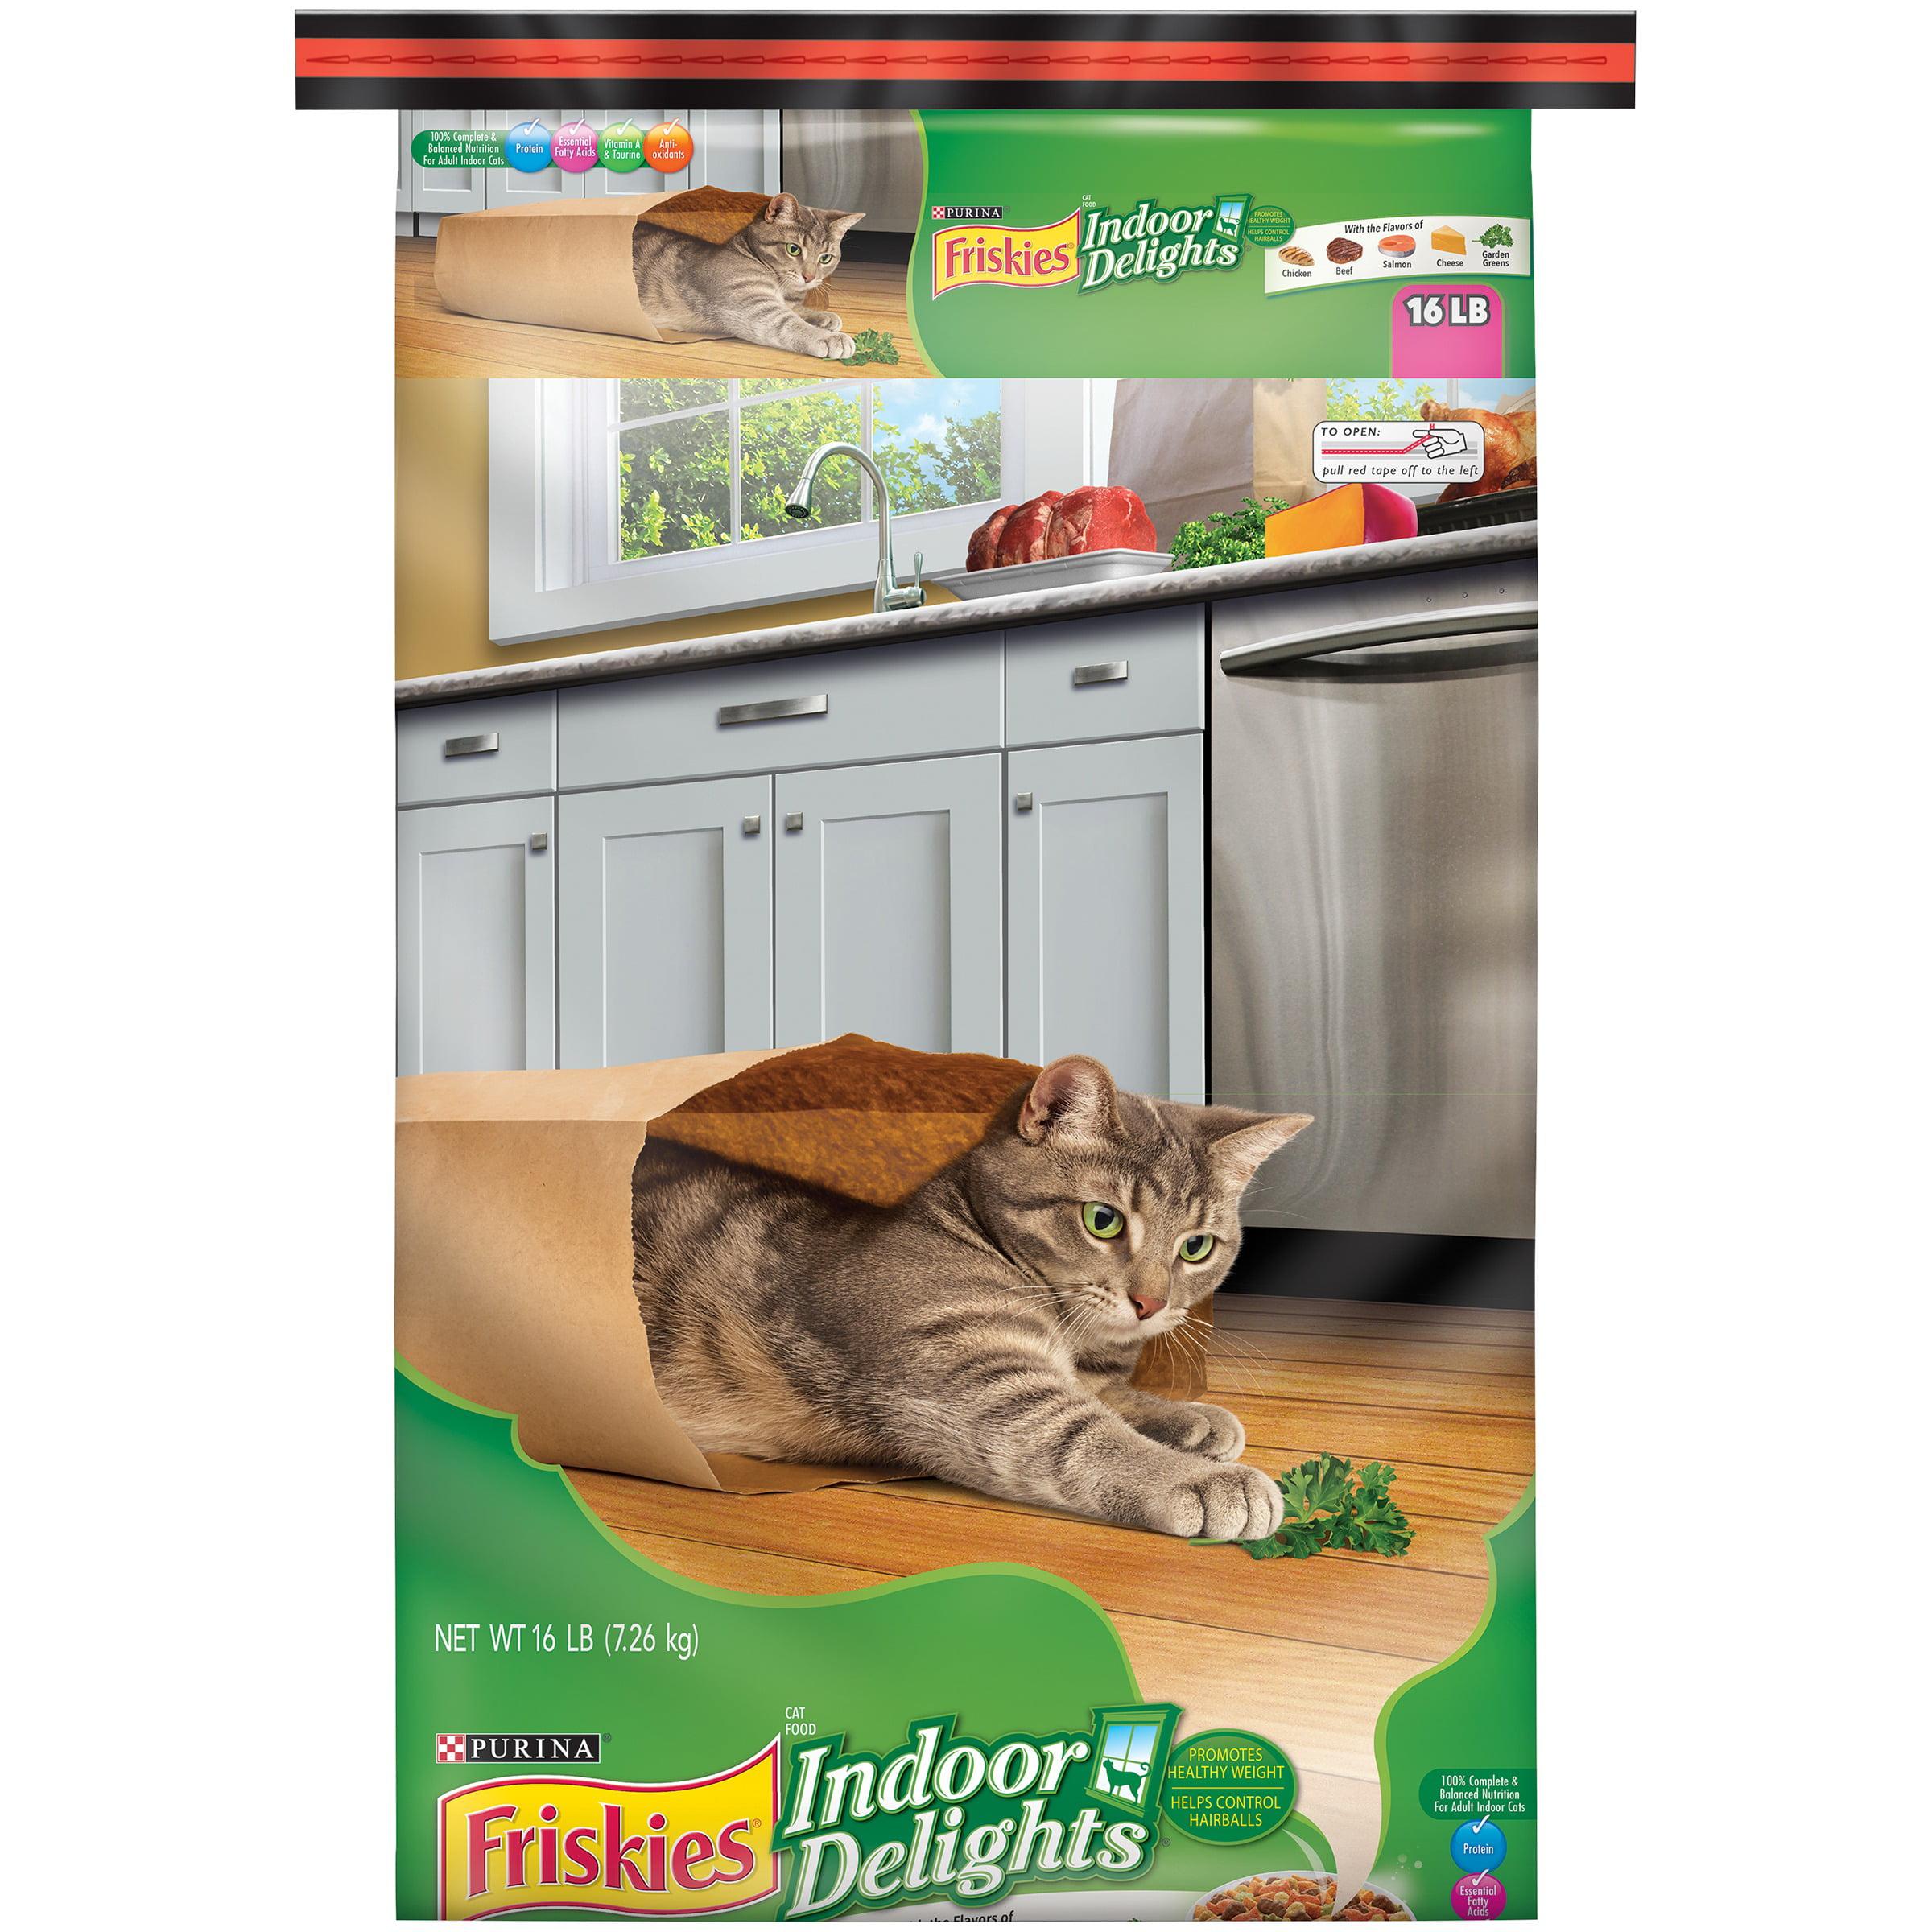 Purina Friskies Indoor Delights Cat Food 16 lb Bag Walmart